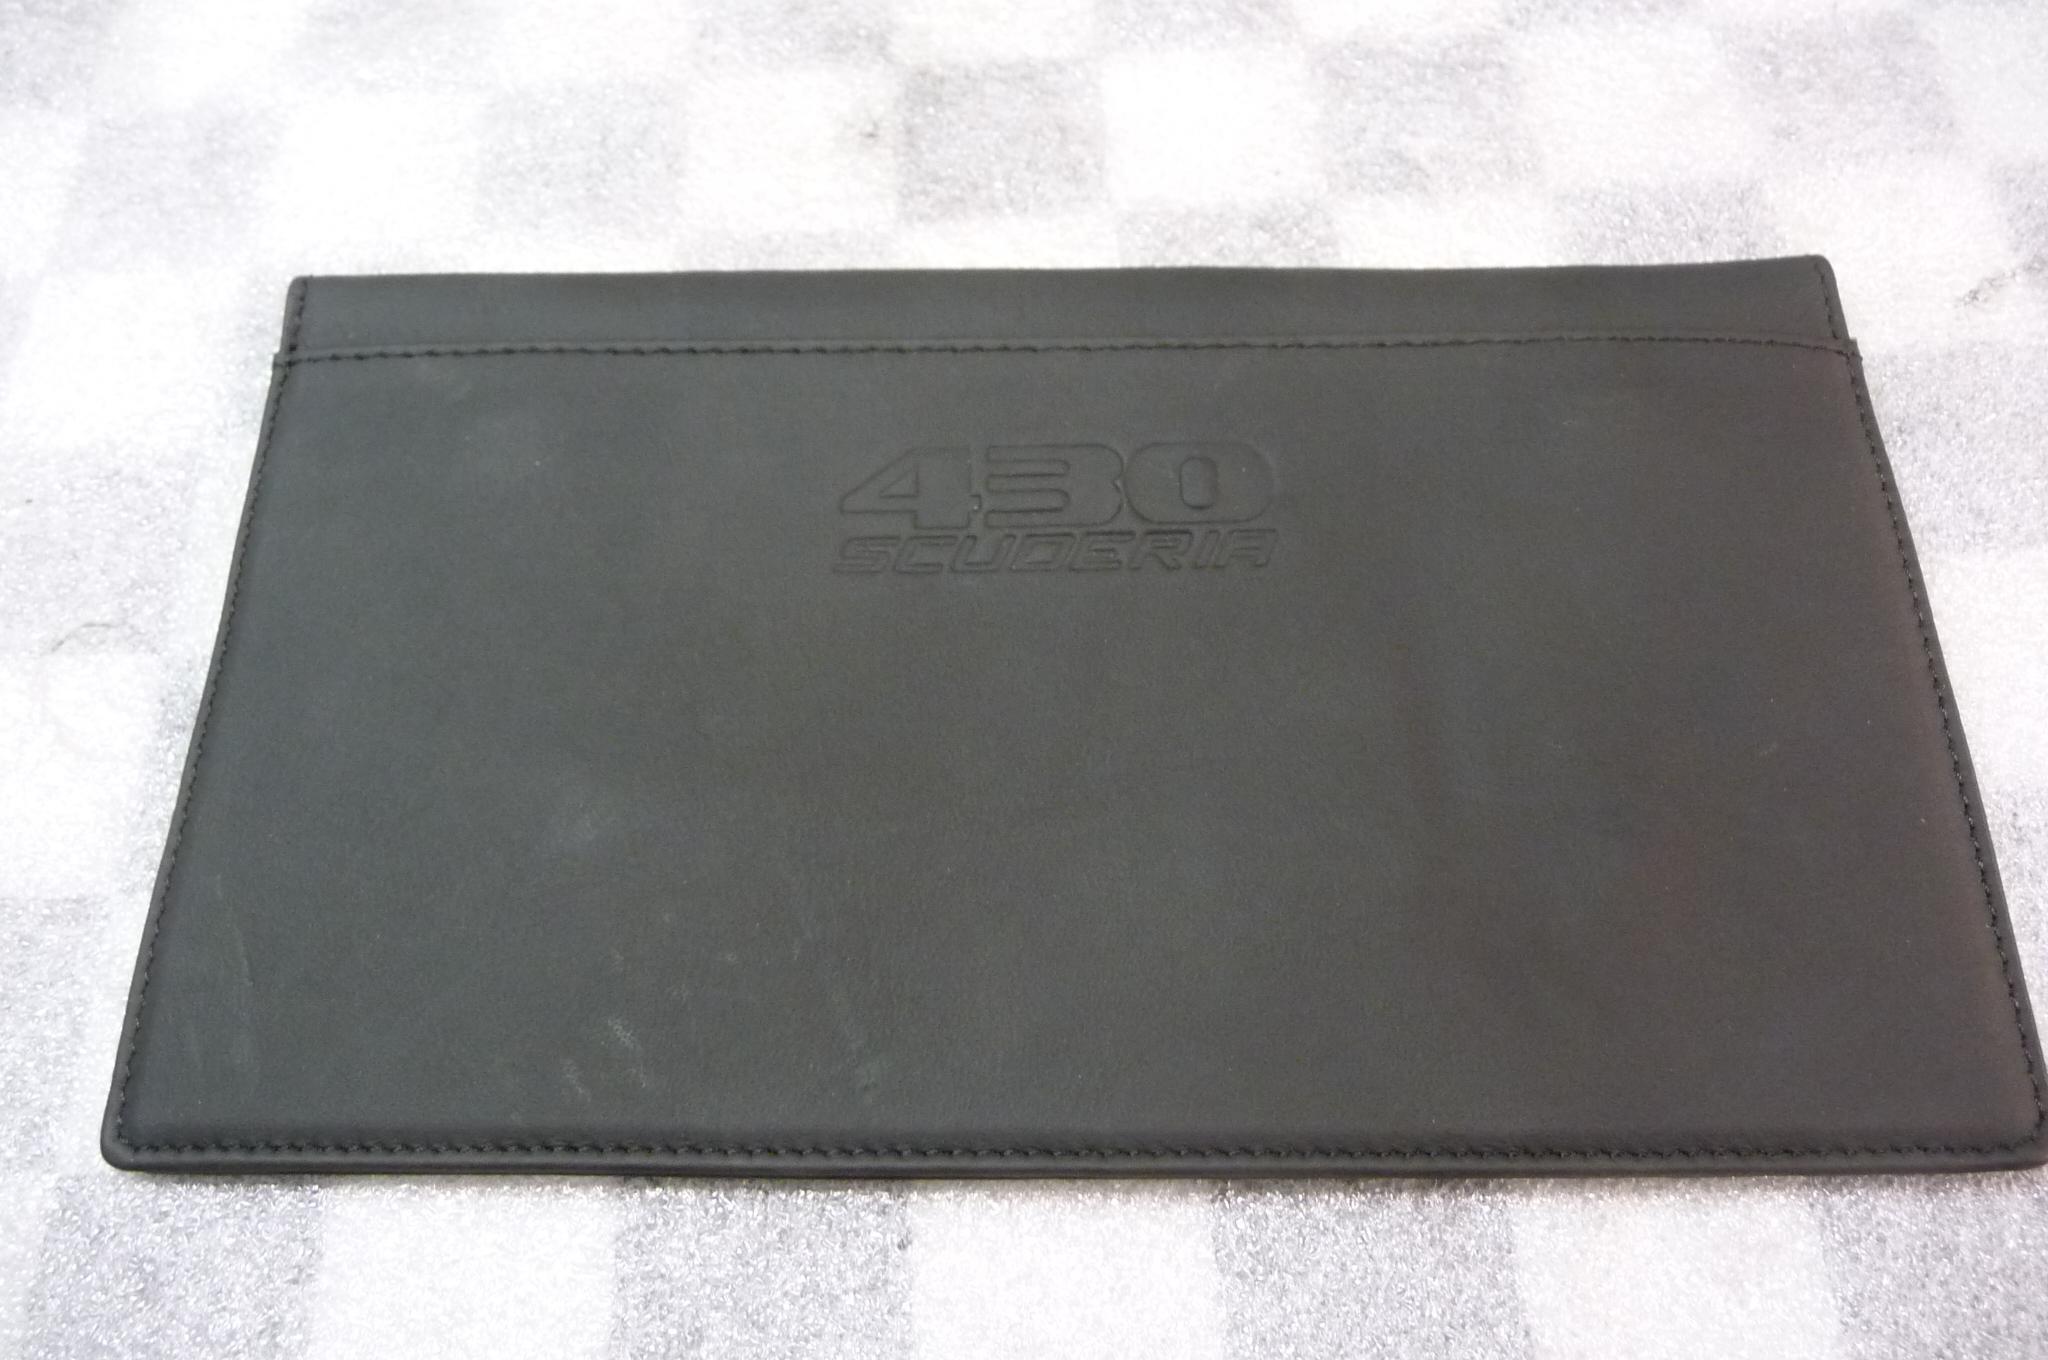 Ferrari F430 430 Scuderia Black Leather Document Envelope 243468 - Used Auto Parts Store | LA Global Parts